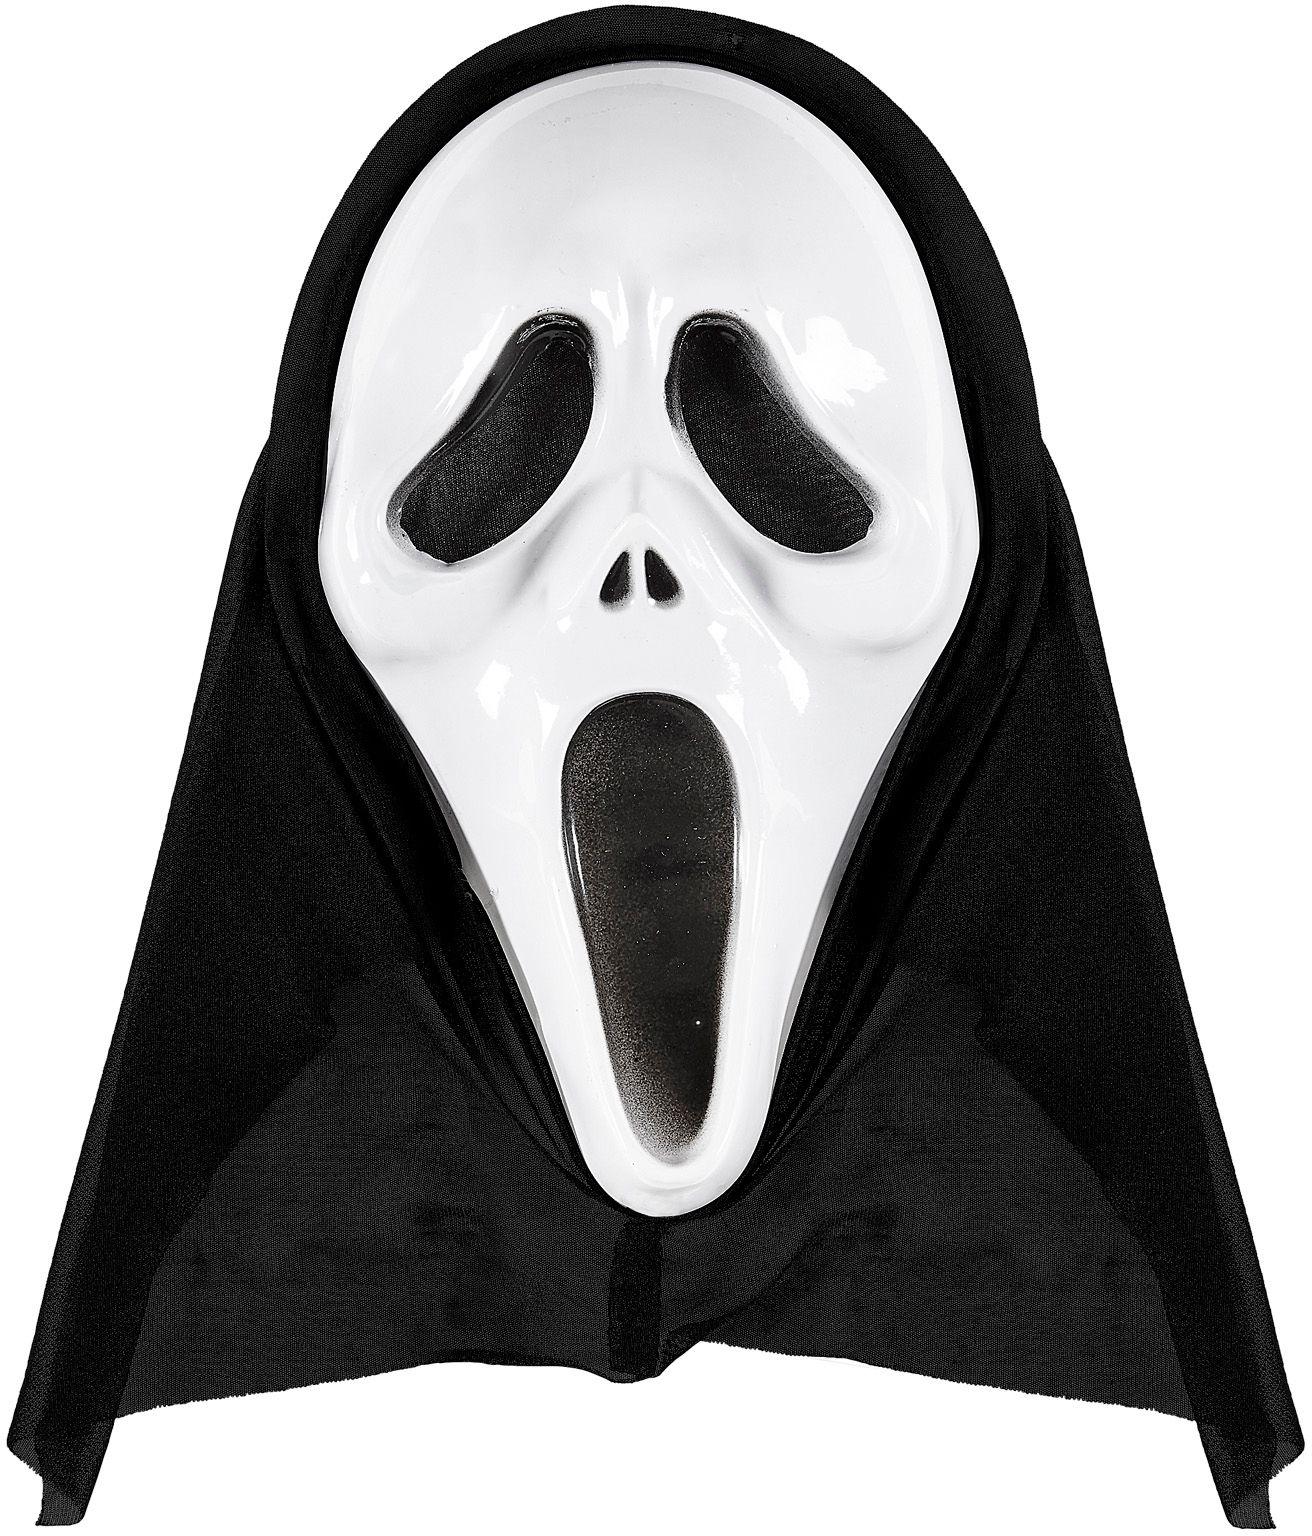 Scream masker wit